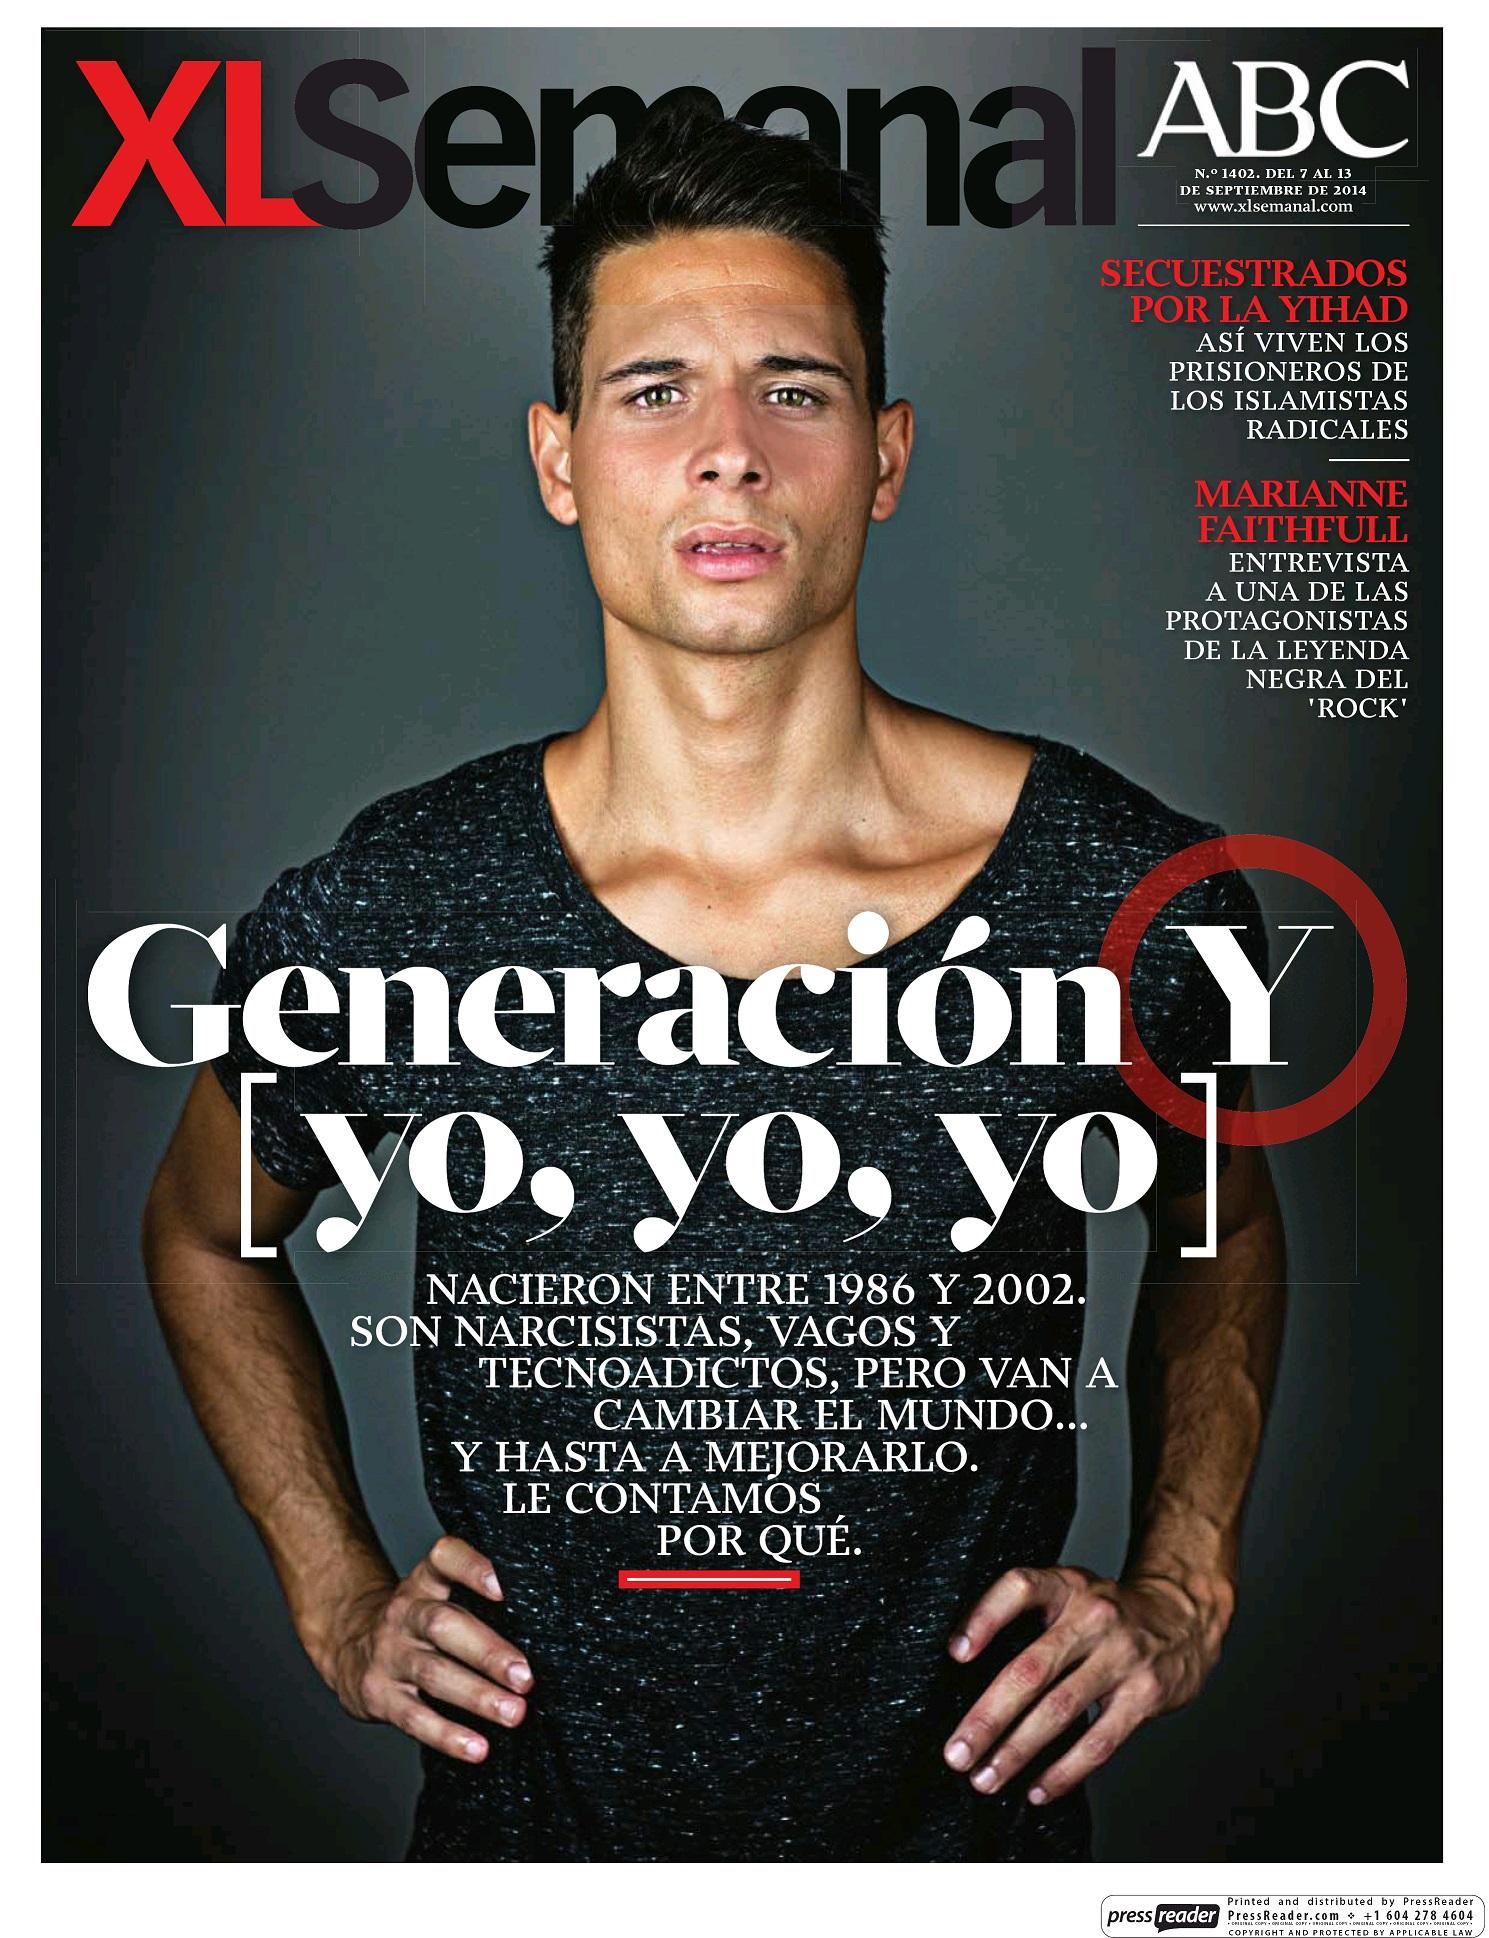 XL SEMANAL portada 8 de Septiembre 2014